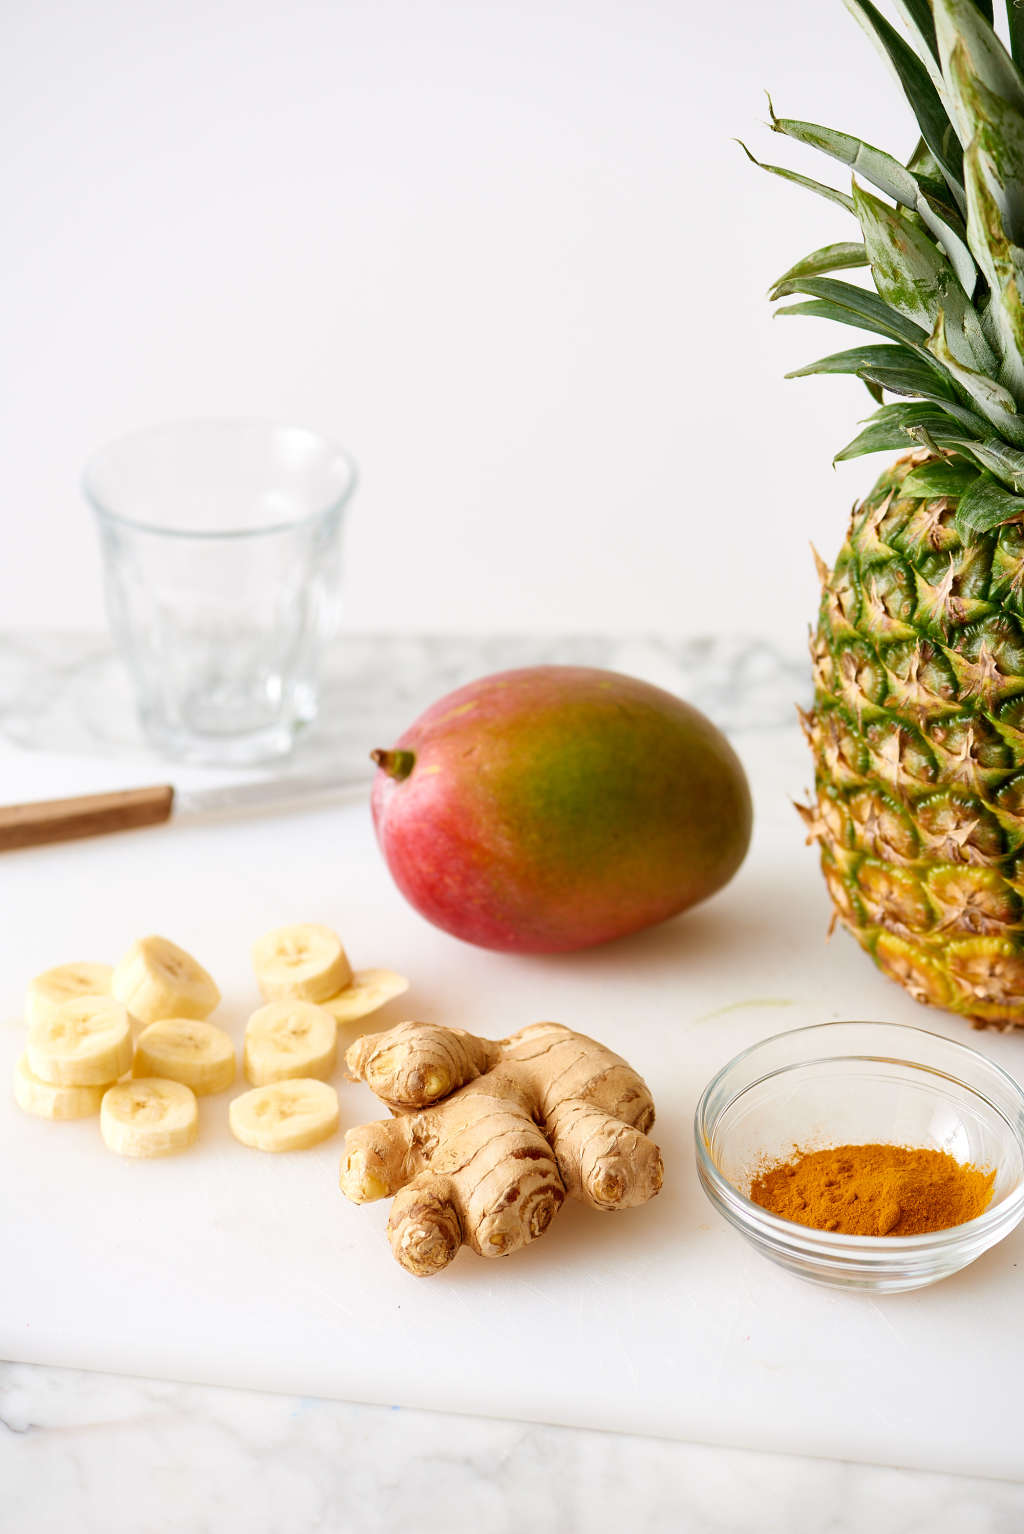 A Make-Ahead Tropical Smoothie Kit with a Turmeric Twist